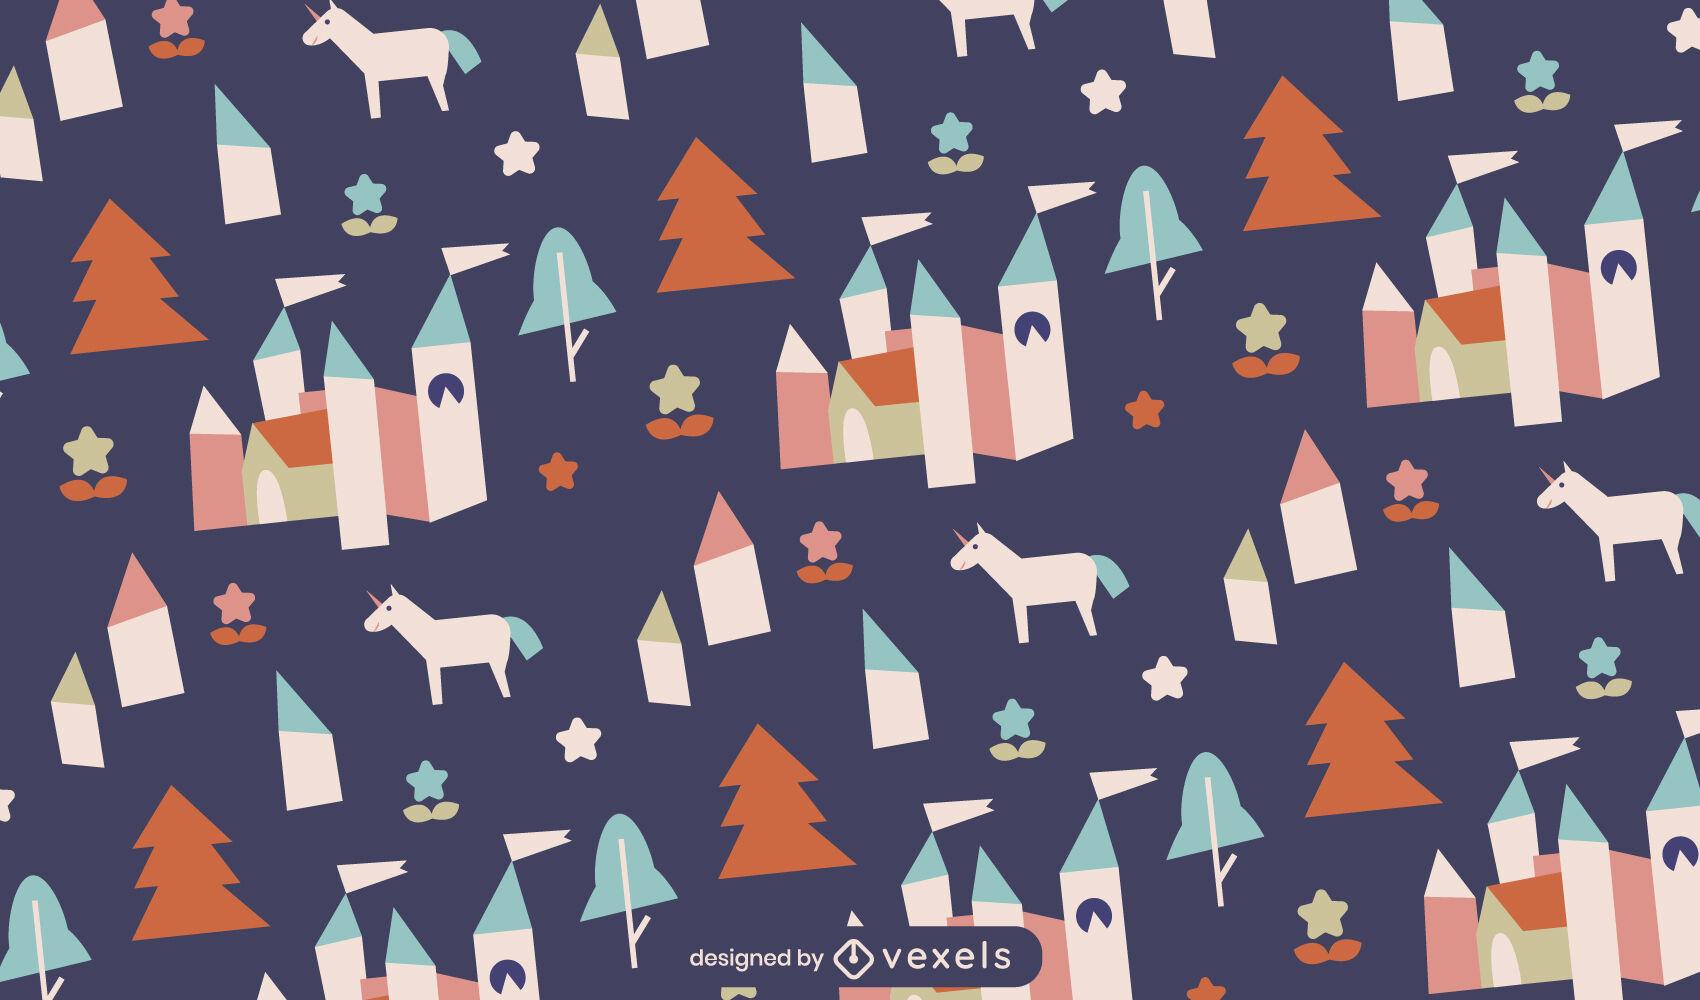 Princess castle fantasy pattern design